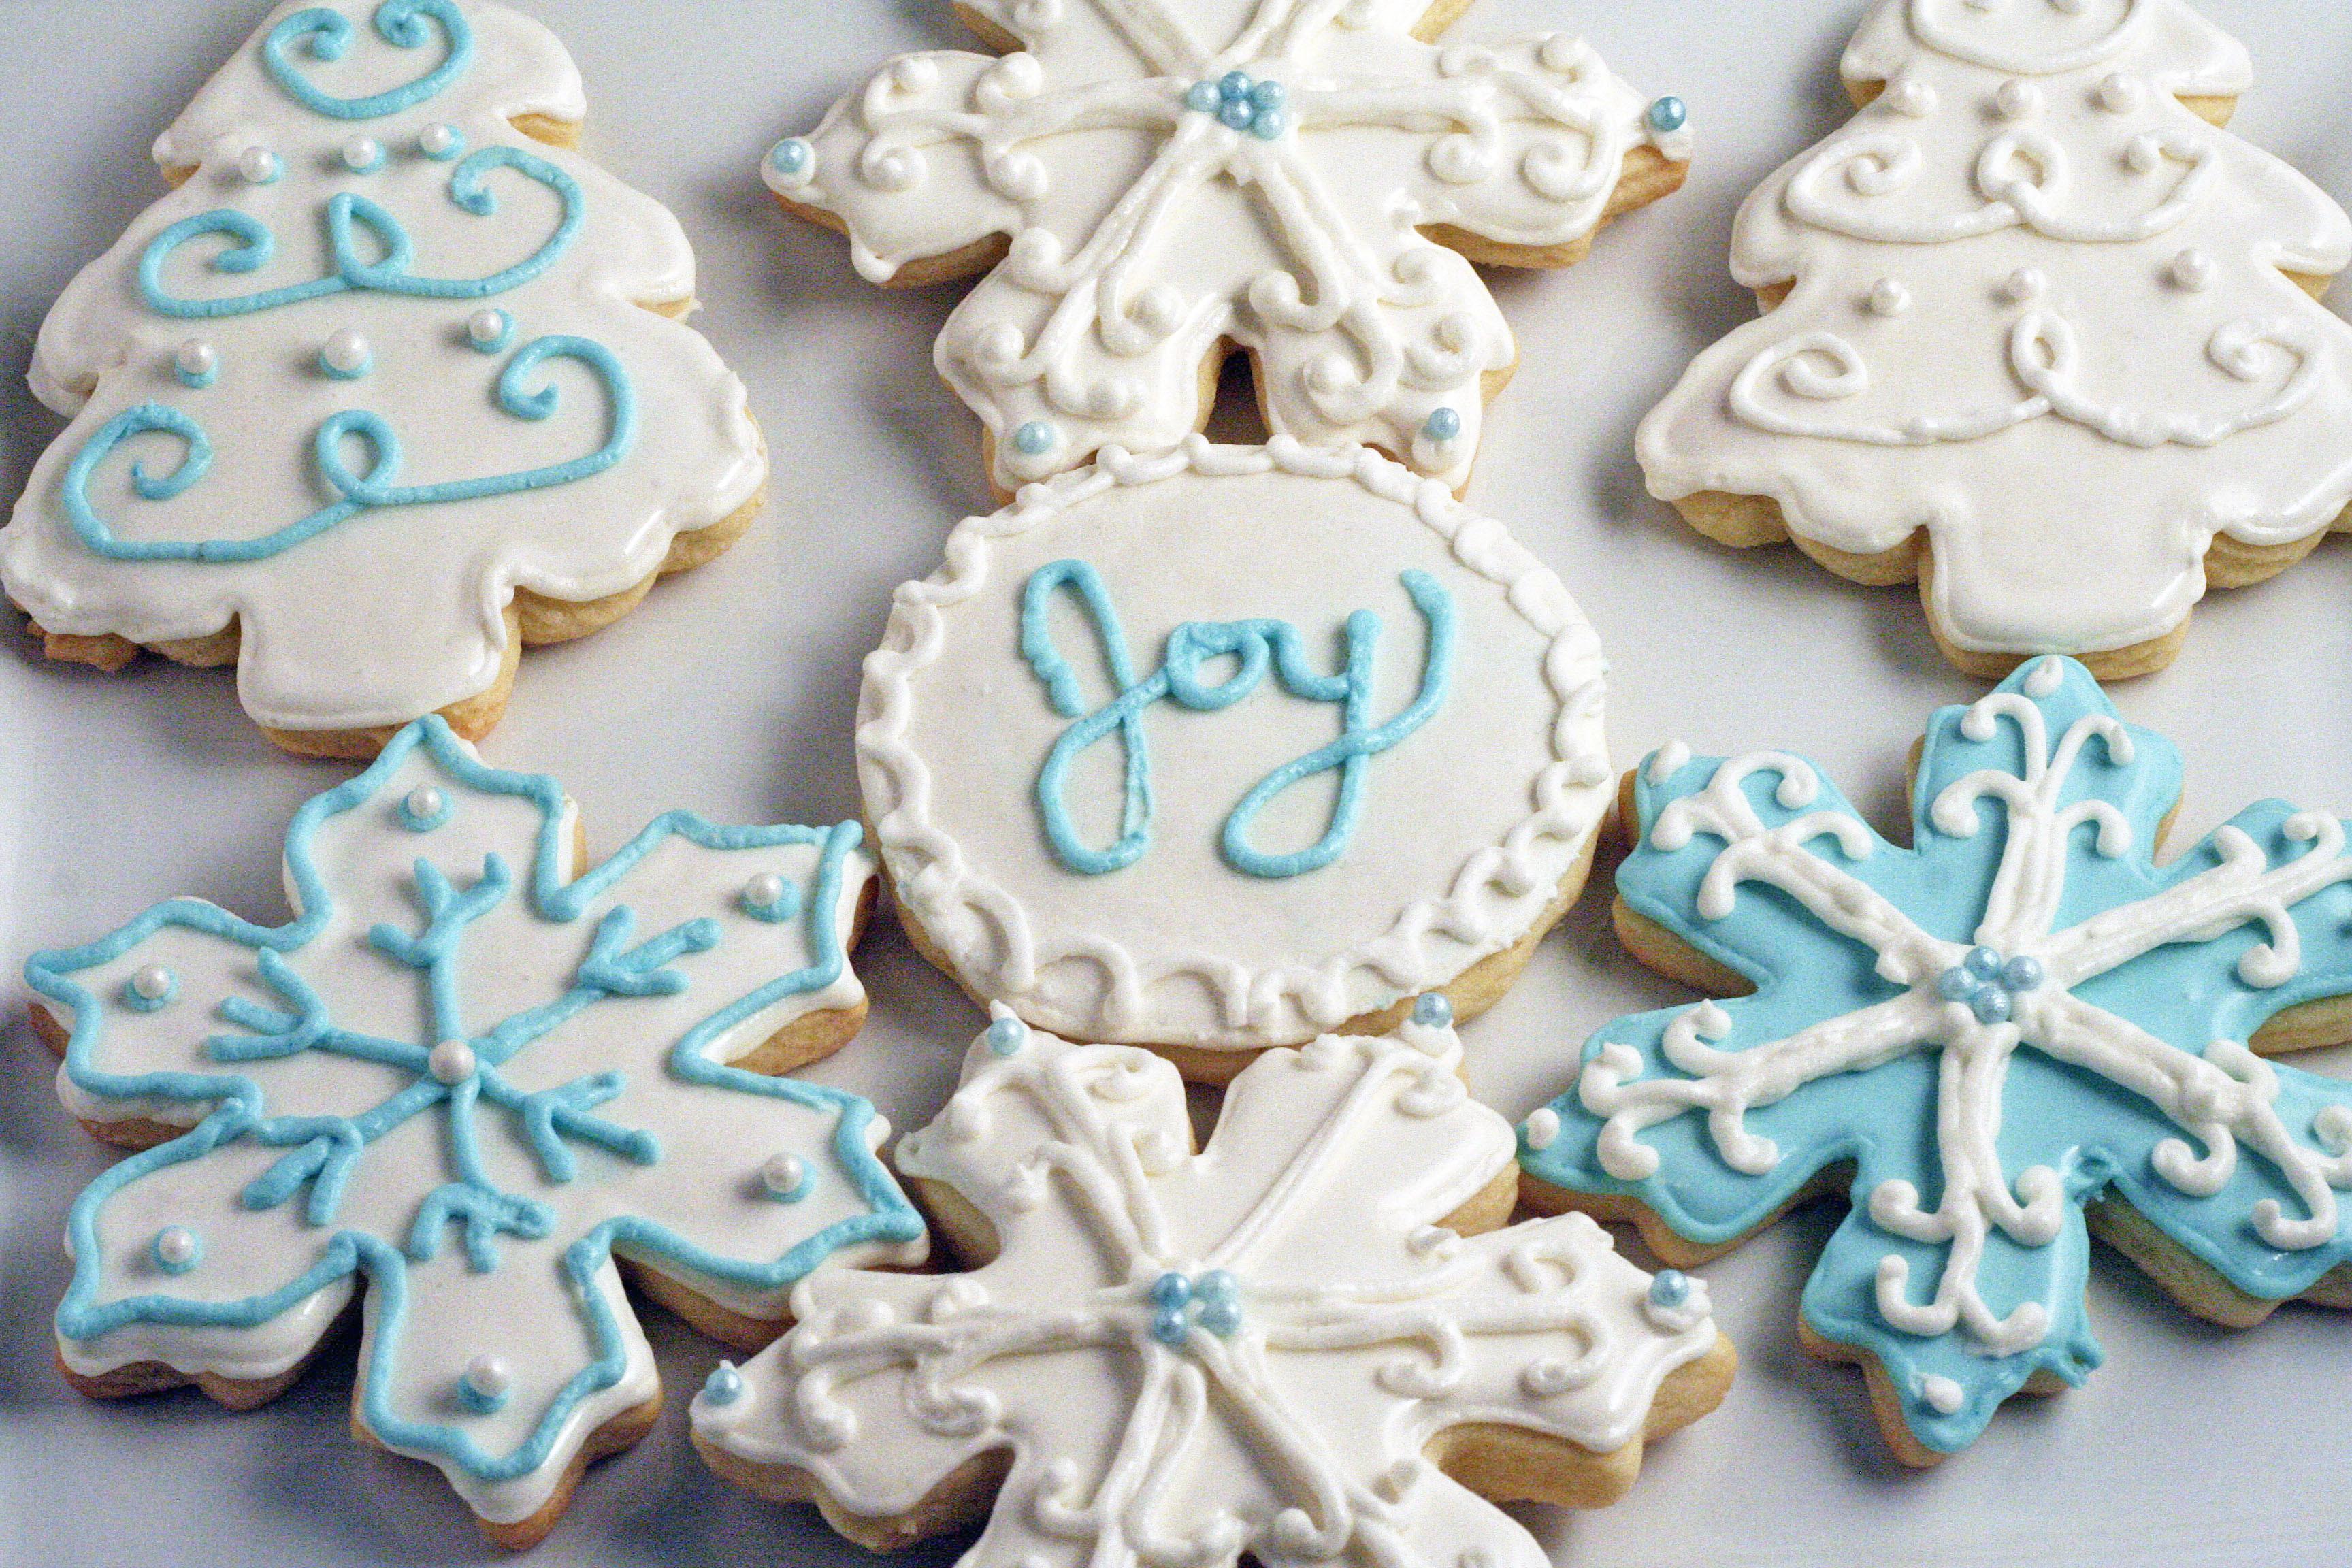 Decorated Sugar Cookies  Decorated Christmas Sugar Cookies